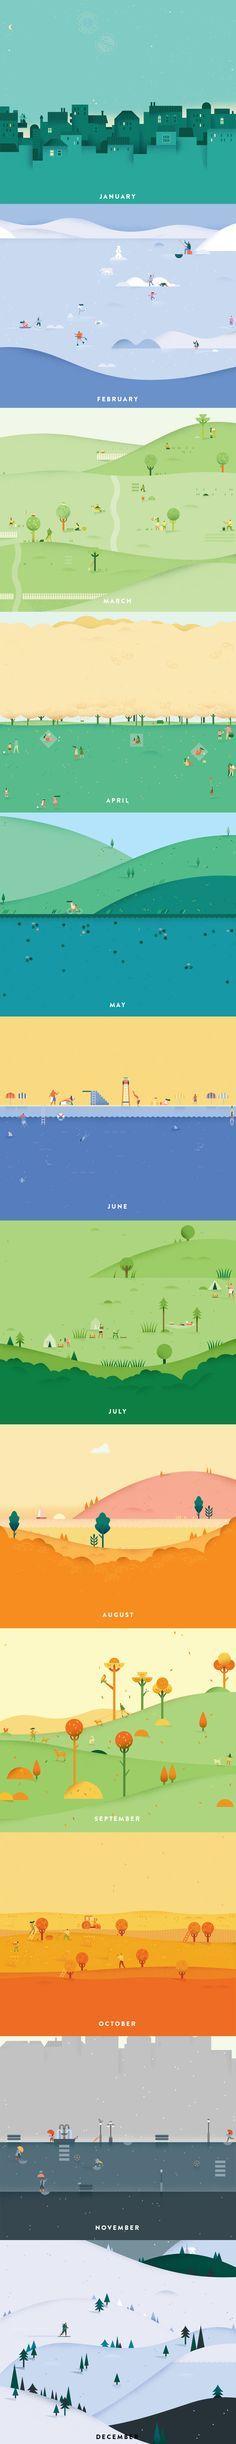 Google Calendar Header Illustrations by Lotta Nieminen 這真的太可愛了啊好想把這種背景功力學起來哦,不過我覺得有些月份的內容和名字不搭